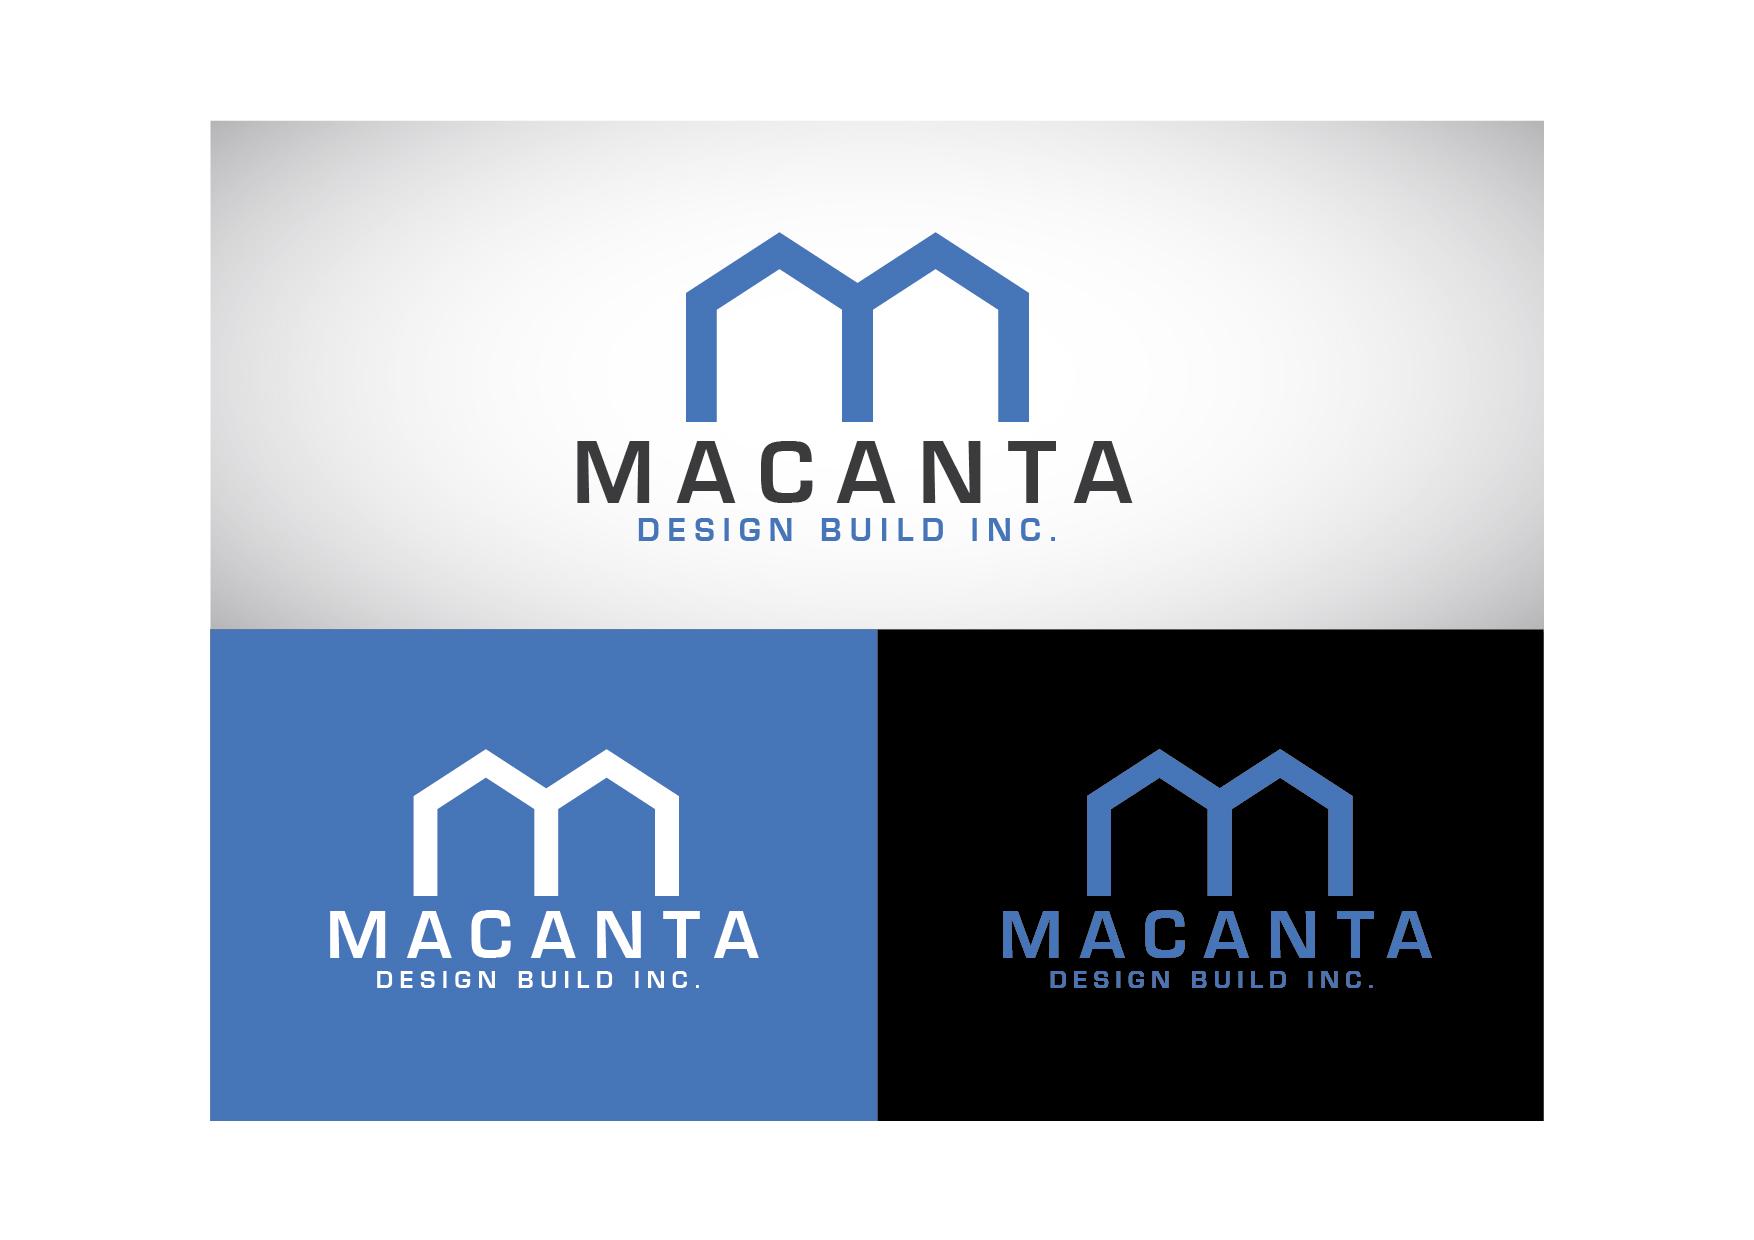 Logo Design by Cutris Lotter - Entry No. 80 in the Logo Design Contest Captivating Logo Design for Macanta Design Build Inc.